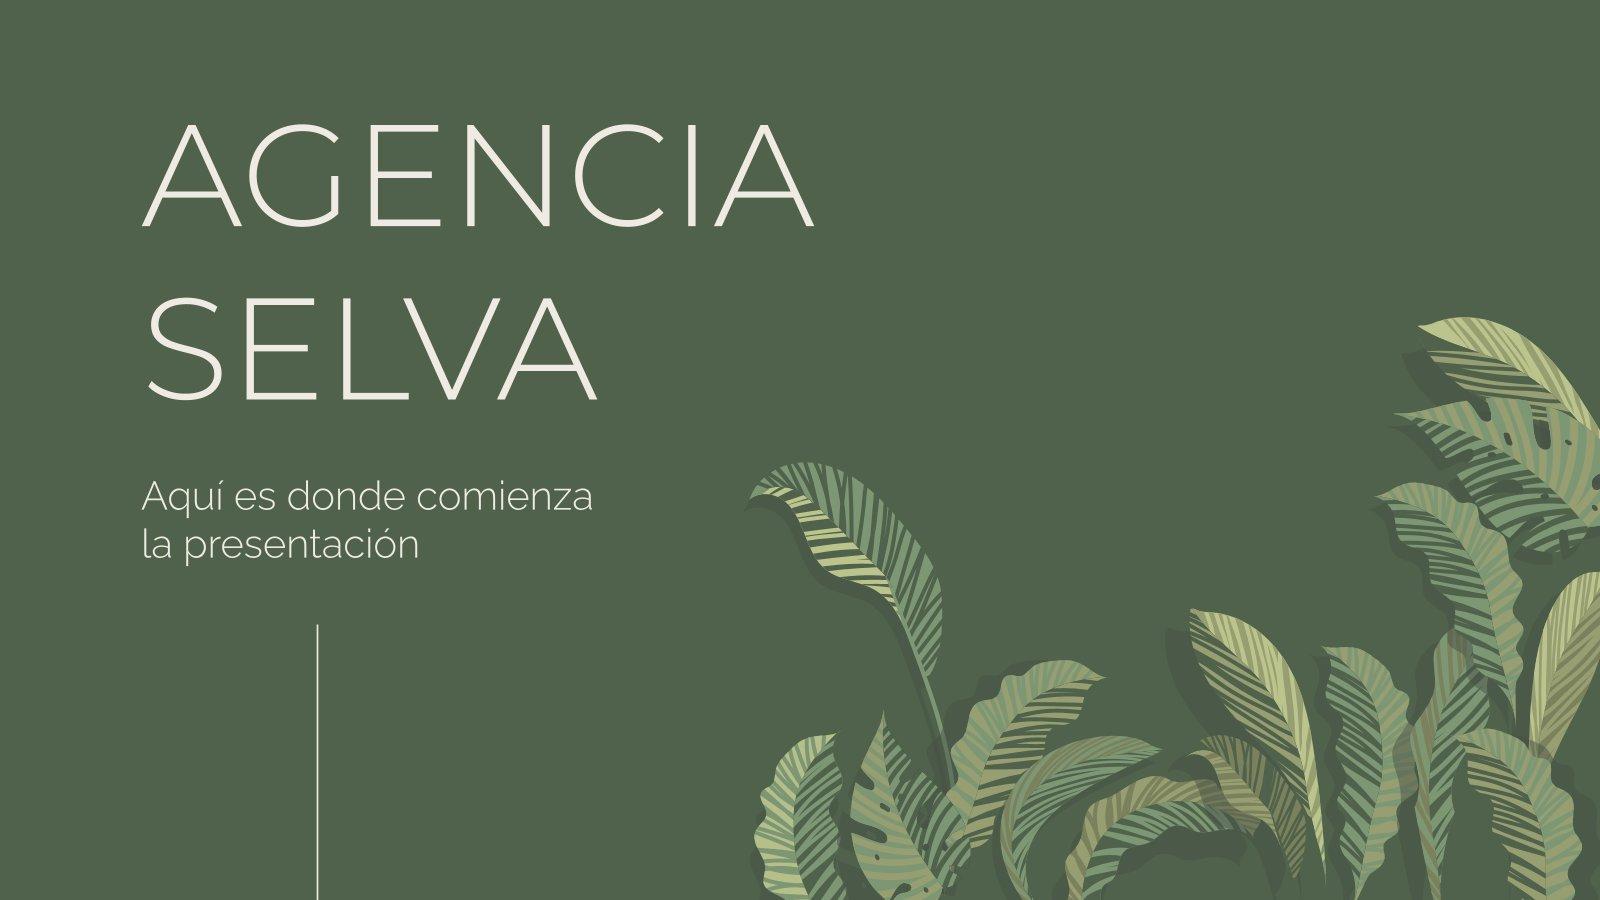 Plantilla de presentación Agencia Selva